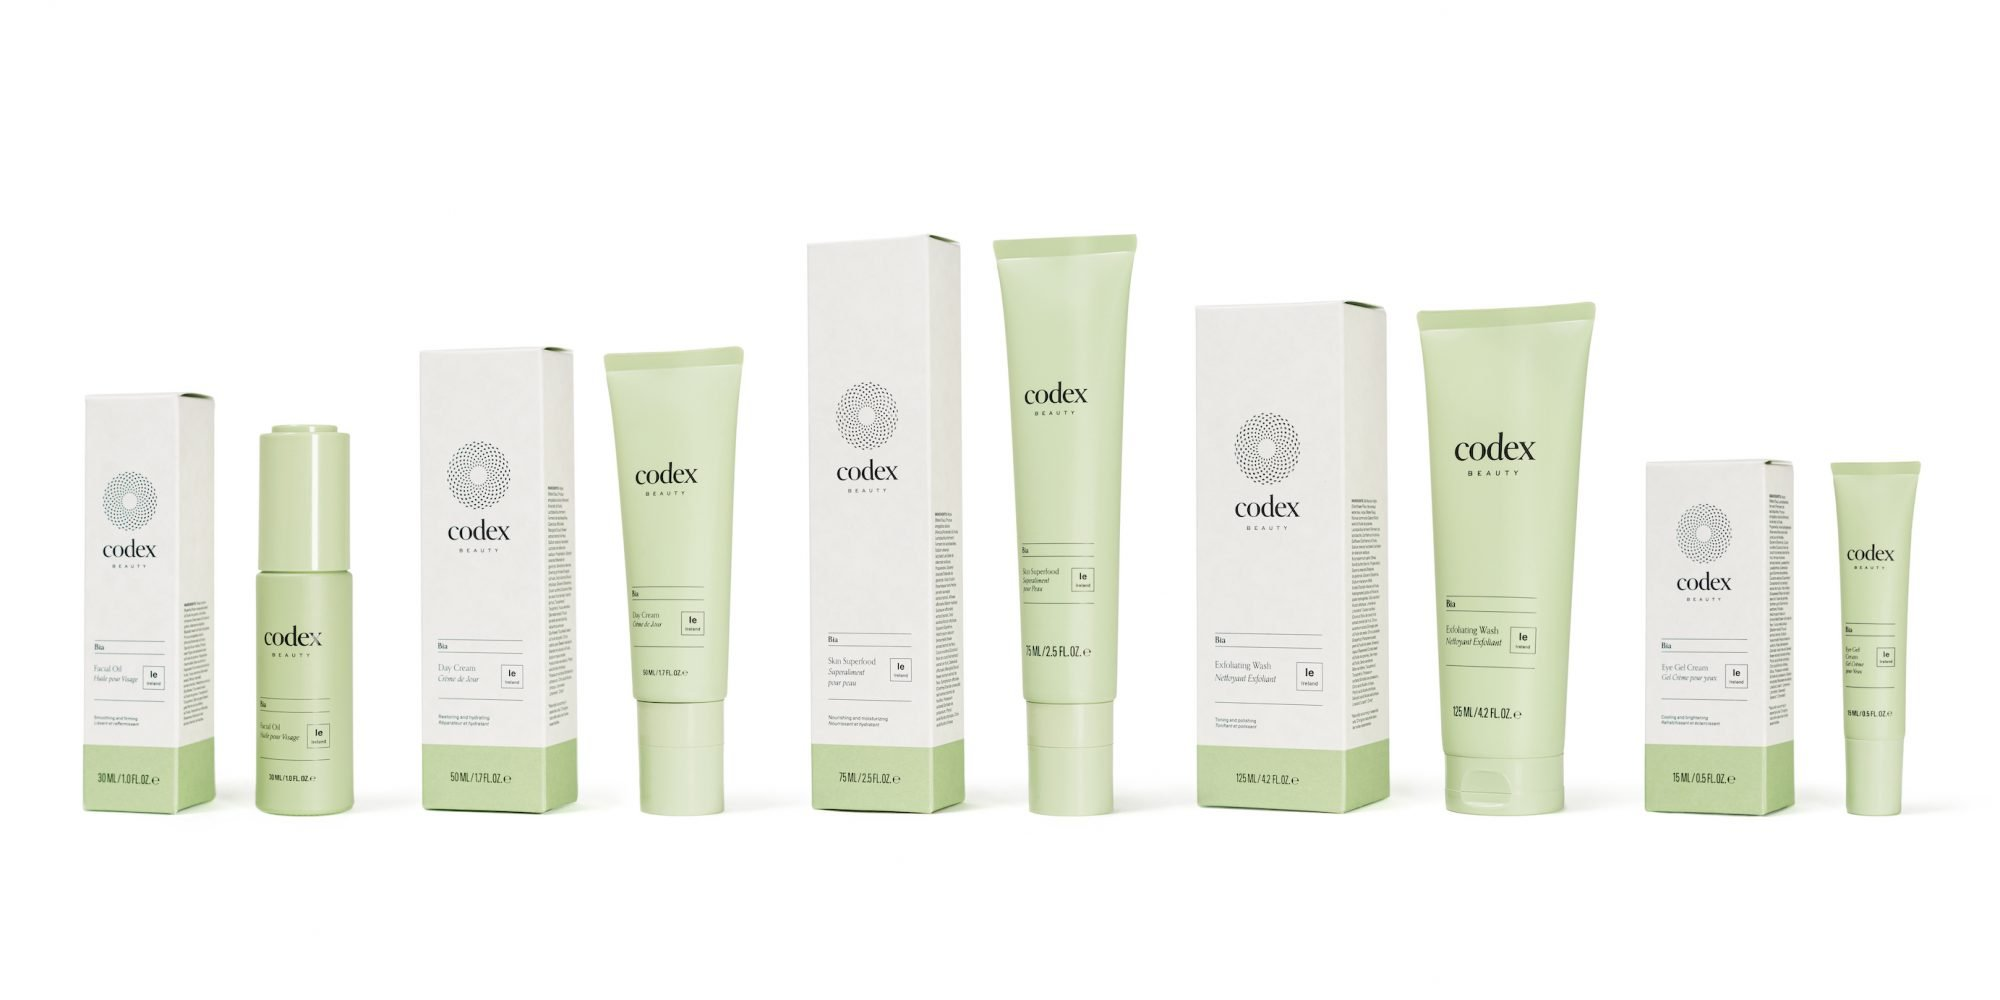 Multibrand Company Codex Beauty Launches With Irish Skincare Line Bia